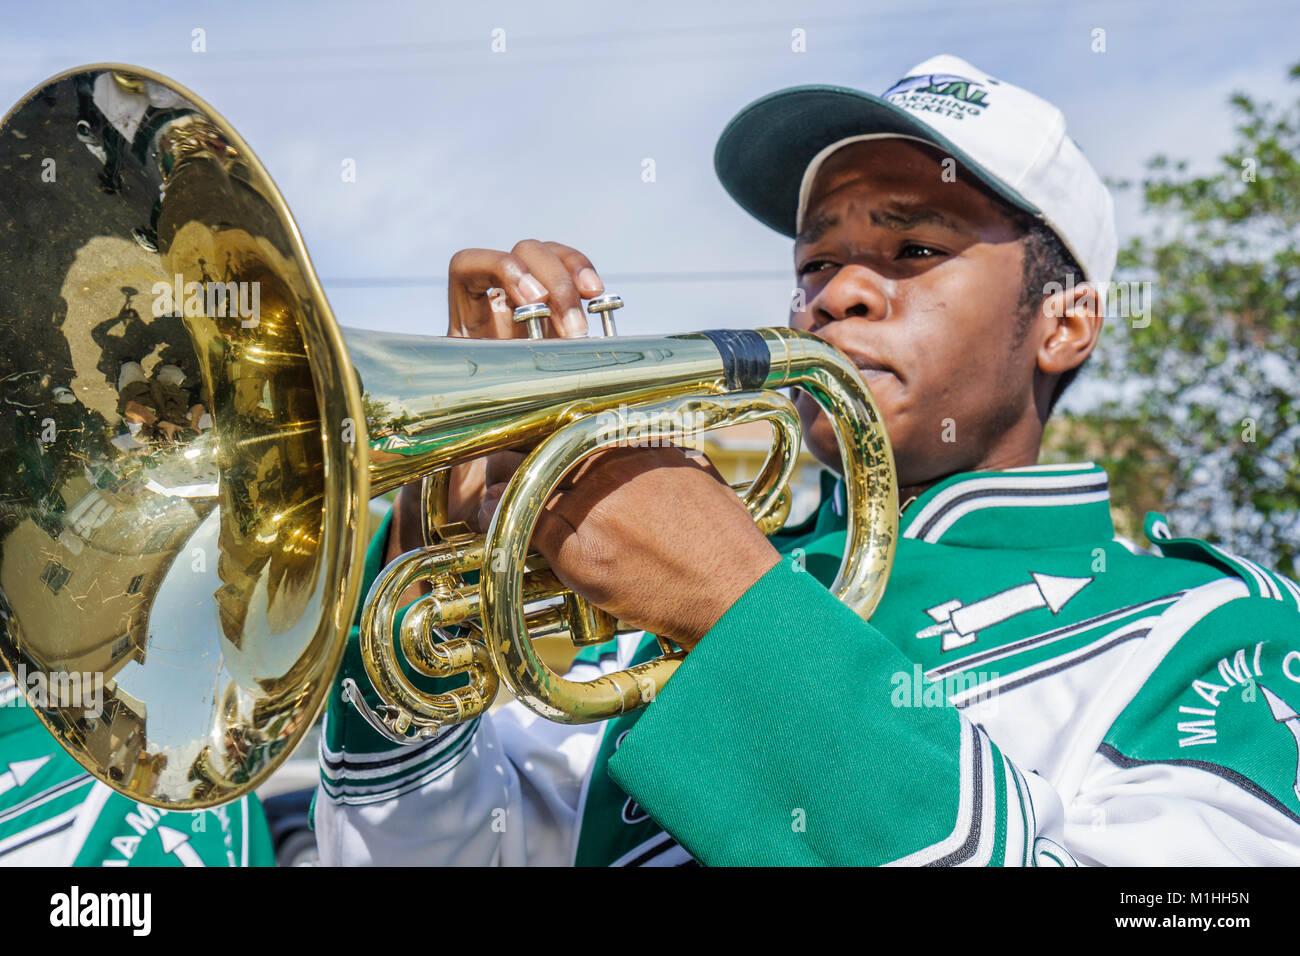 Brass Instrument Stock Photos & Brass Instrument Stock Images - Alamy